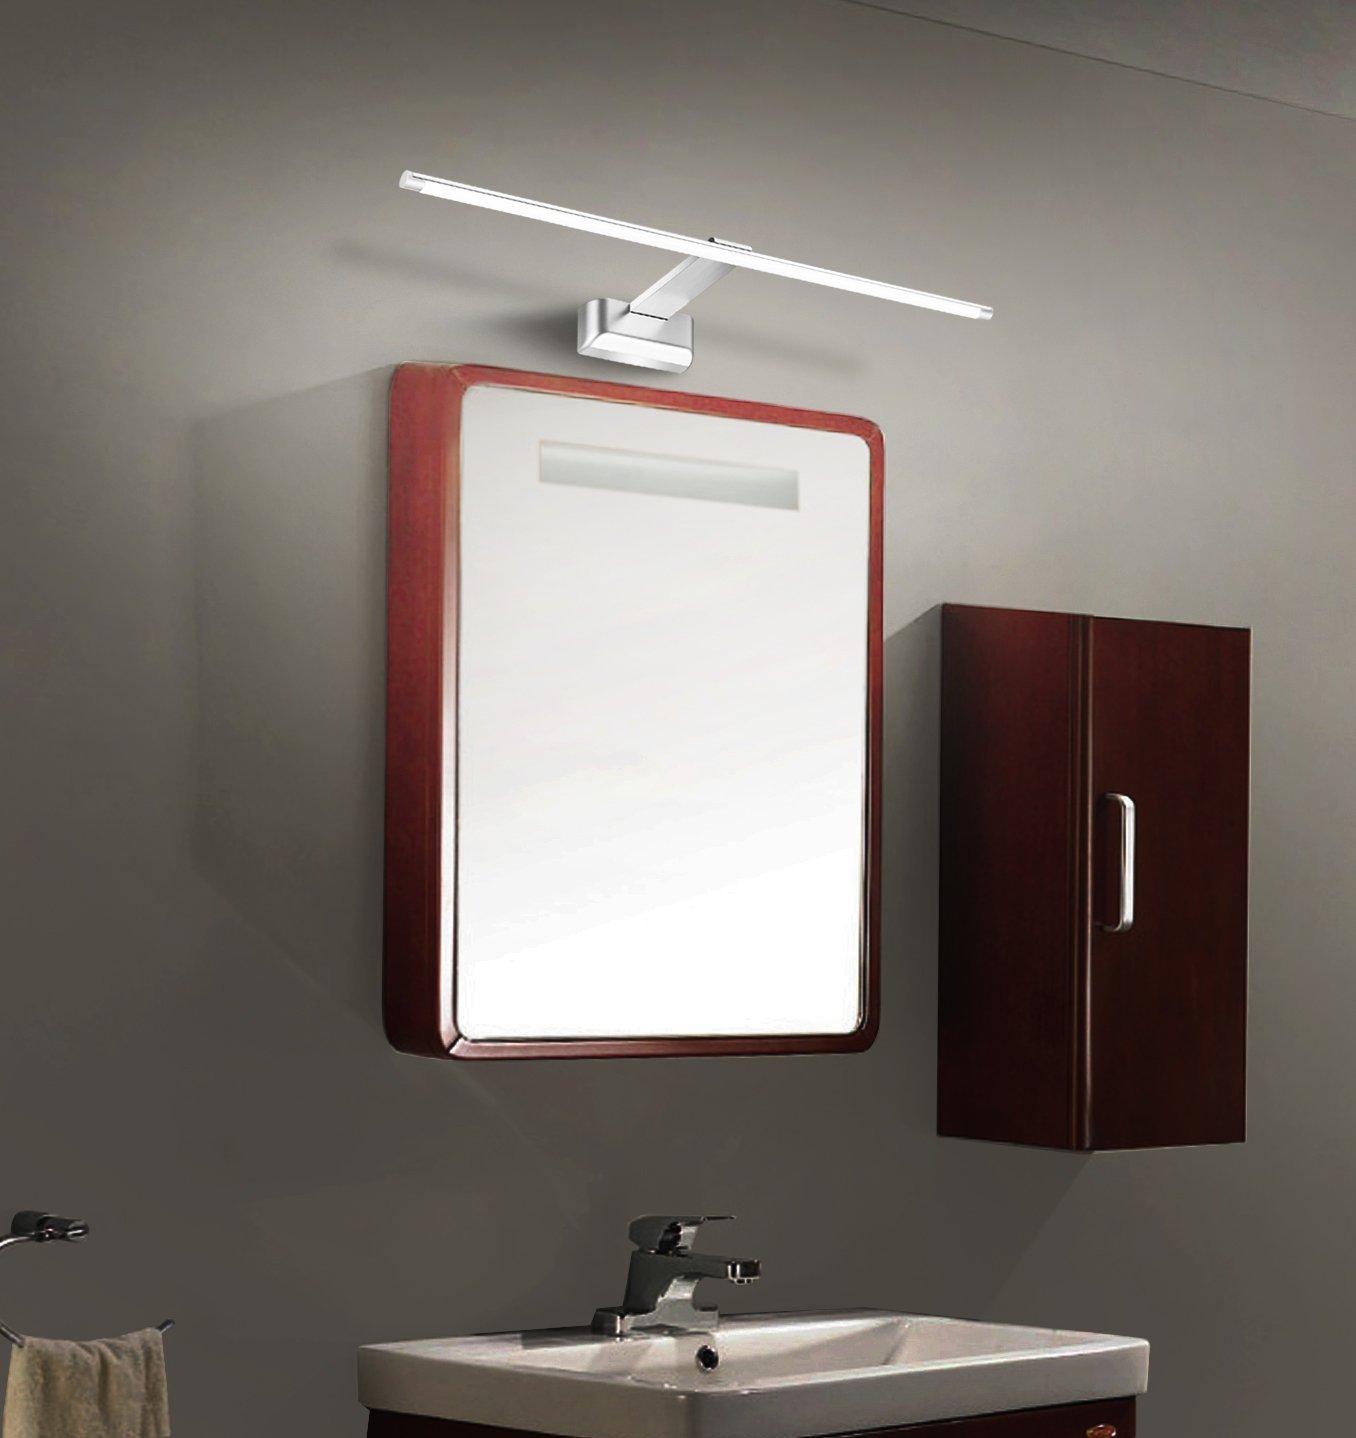 Promoci nFVTLED 9W LED SMD L mpara de Pared para Ba o